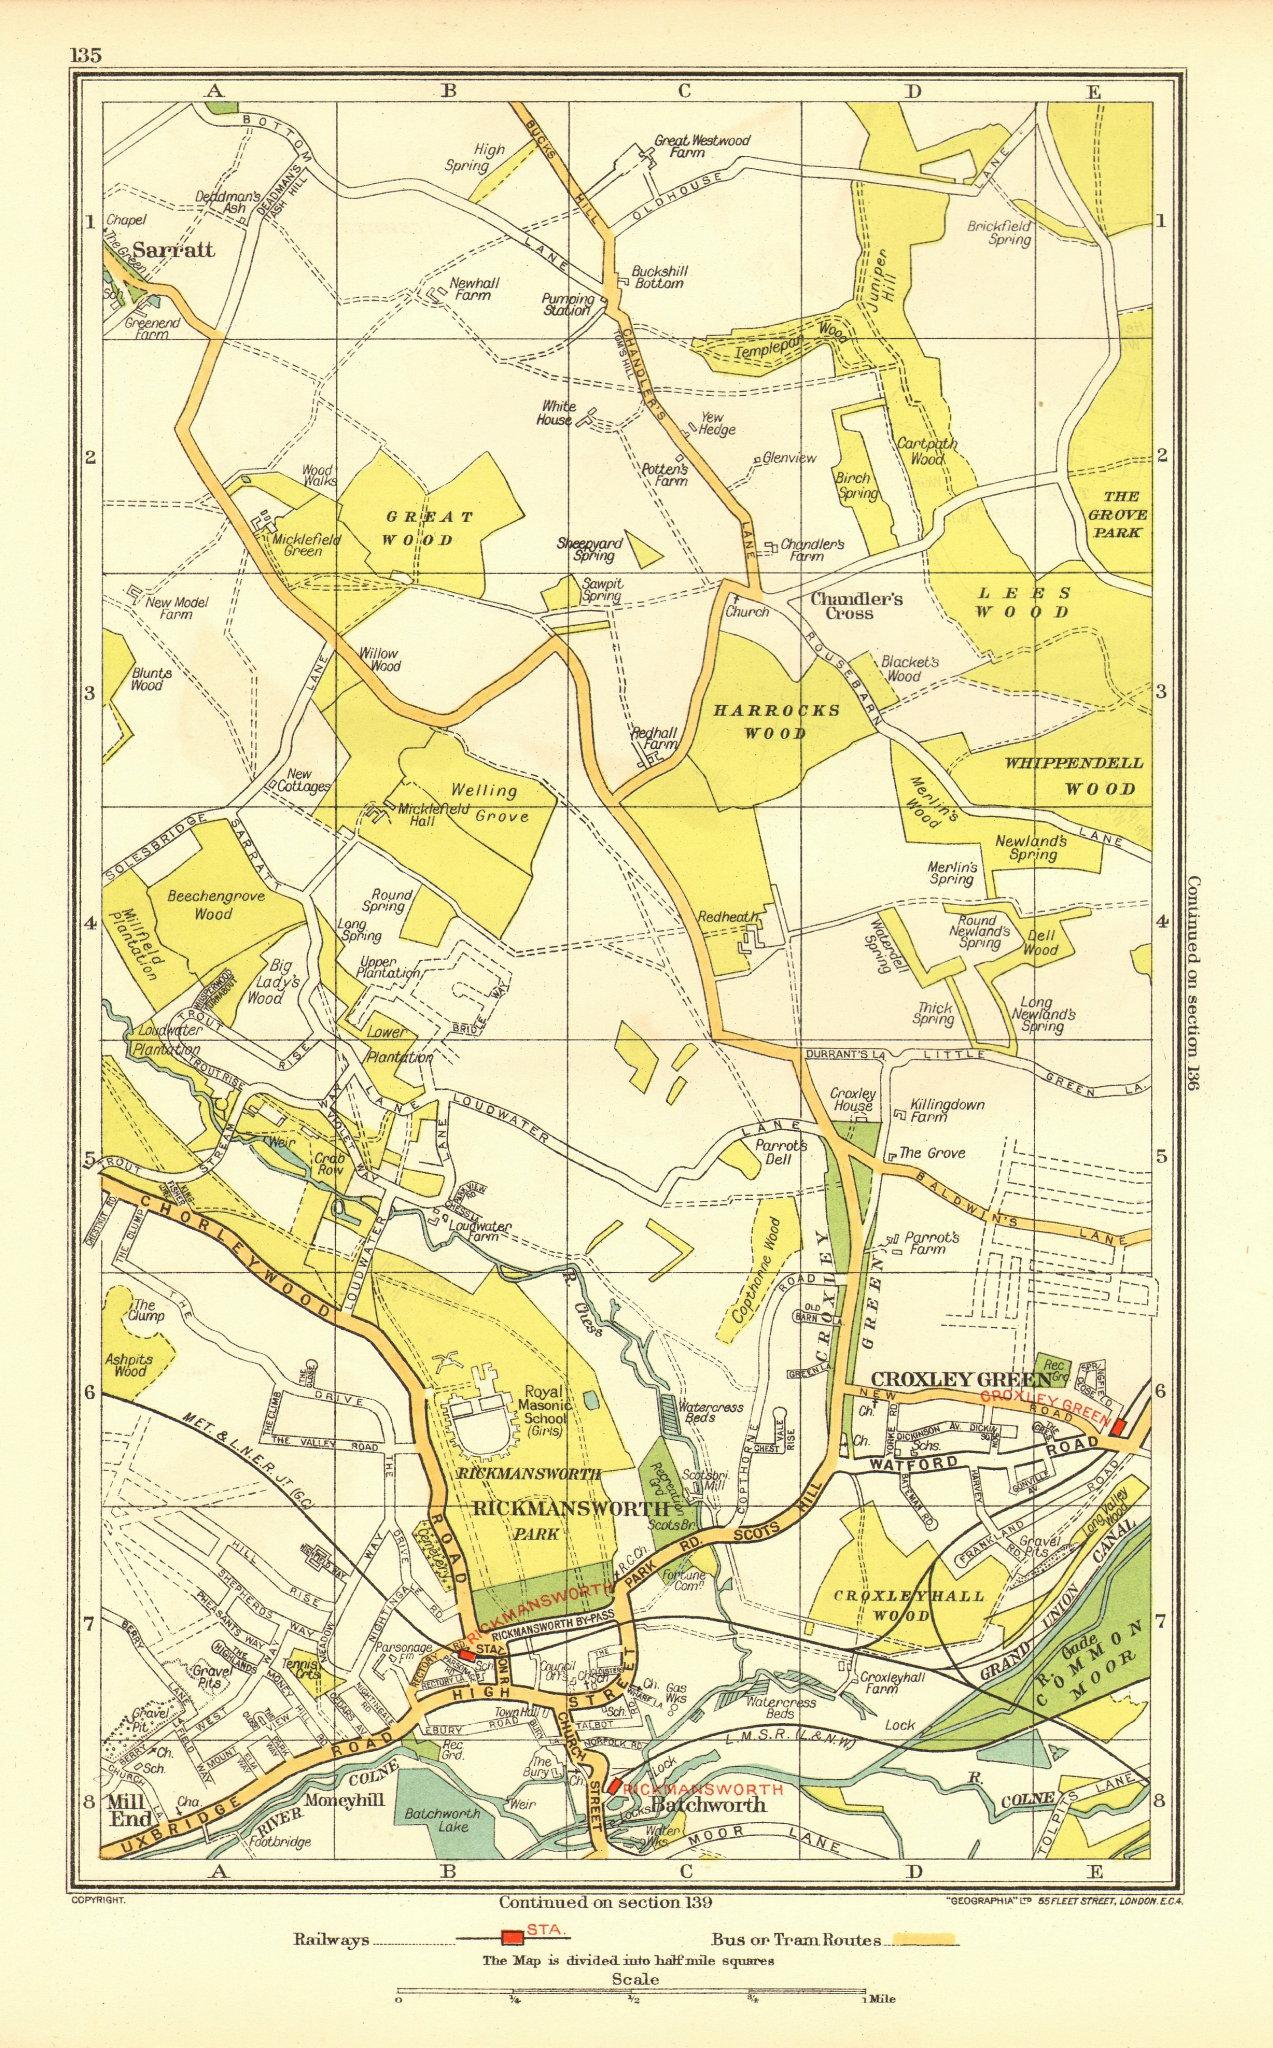 RICKMANSWORTH. Chandler's Cross Chorleywood Sarratt Croxley Green 1937 old map